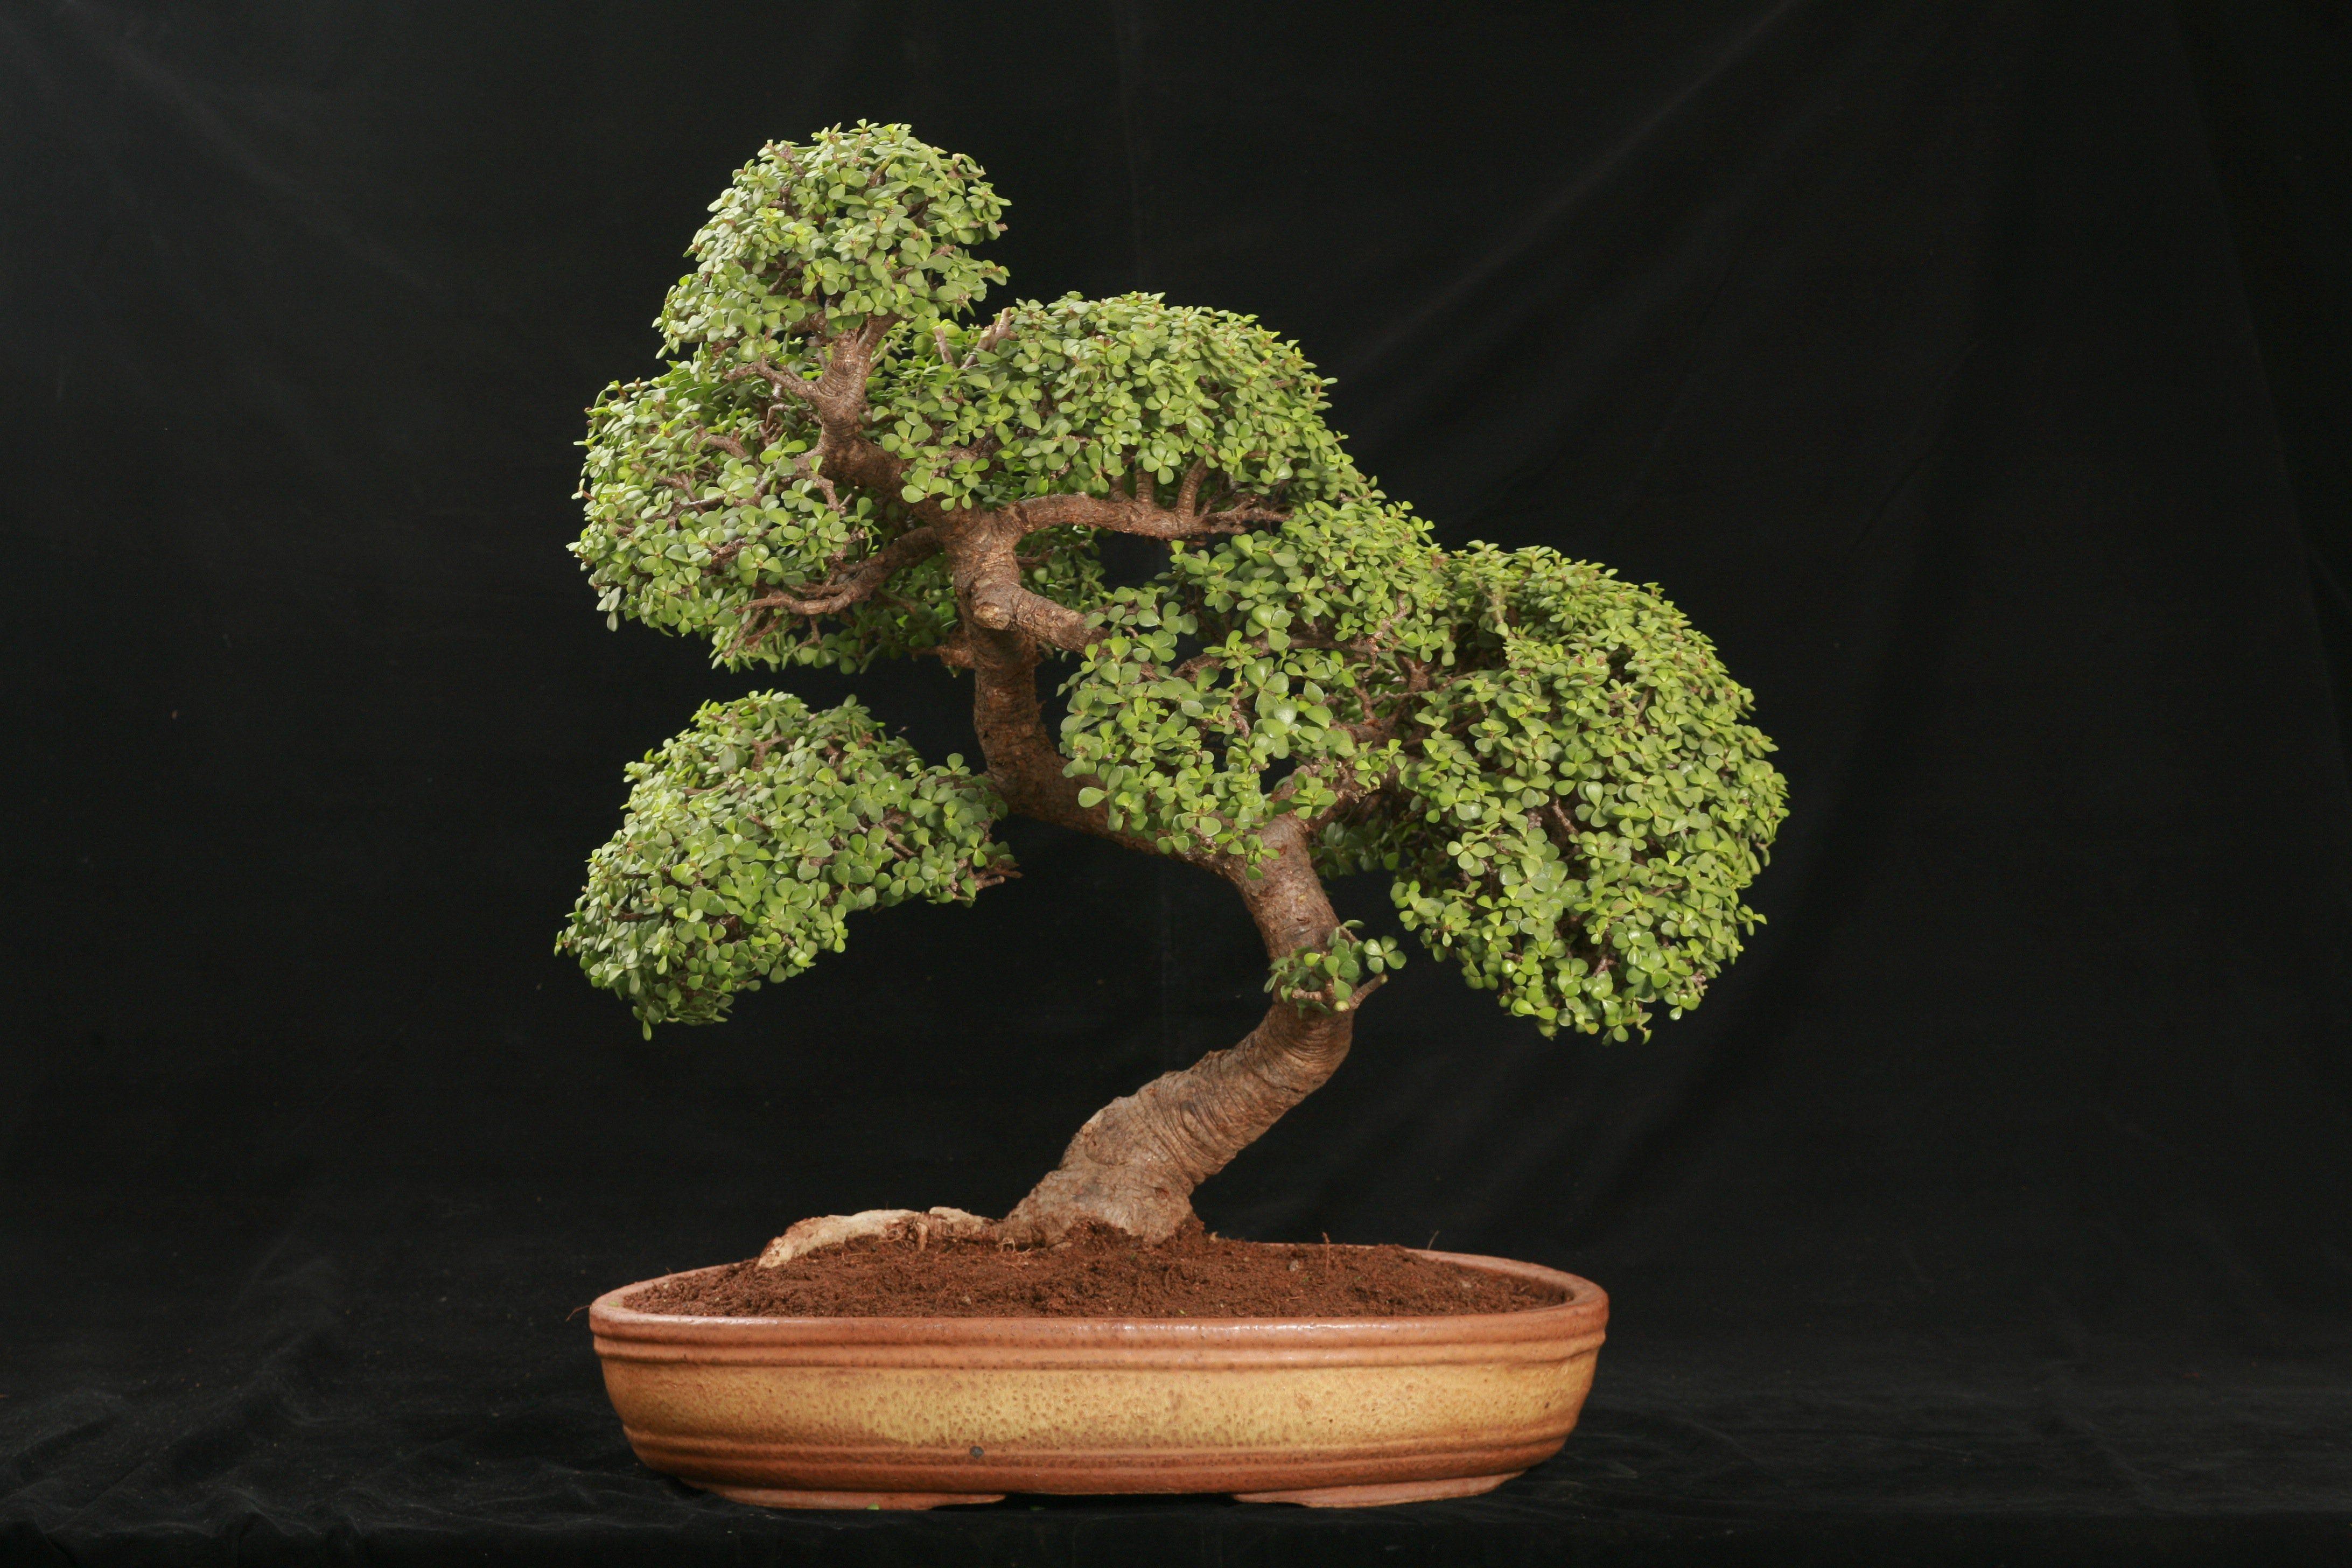 Jade Bonsai Tree Care Guide Crassula Ovata Bonsai Tree Gardener Jade Bonsai Bonsai Tree Bonsai Tree Care